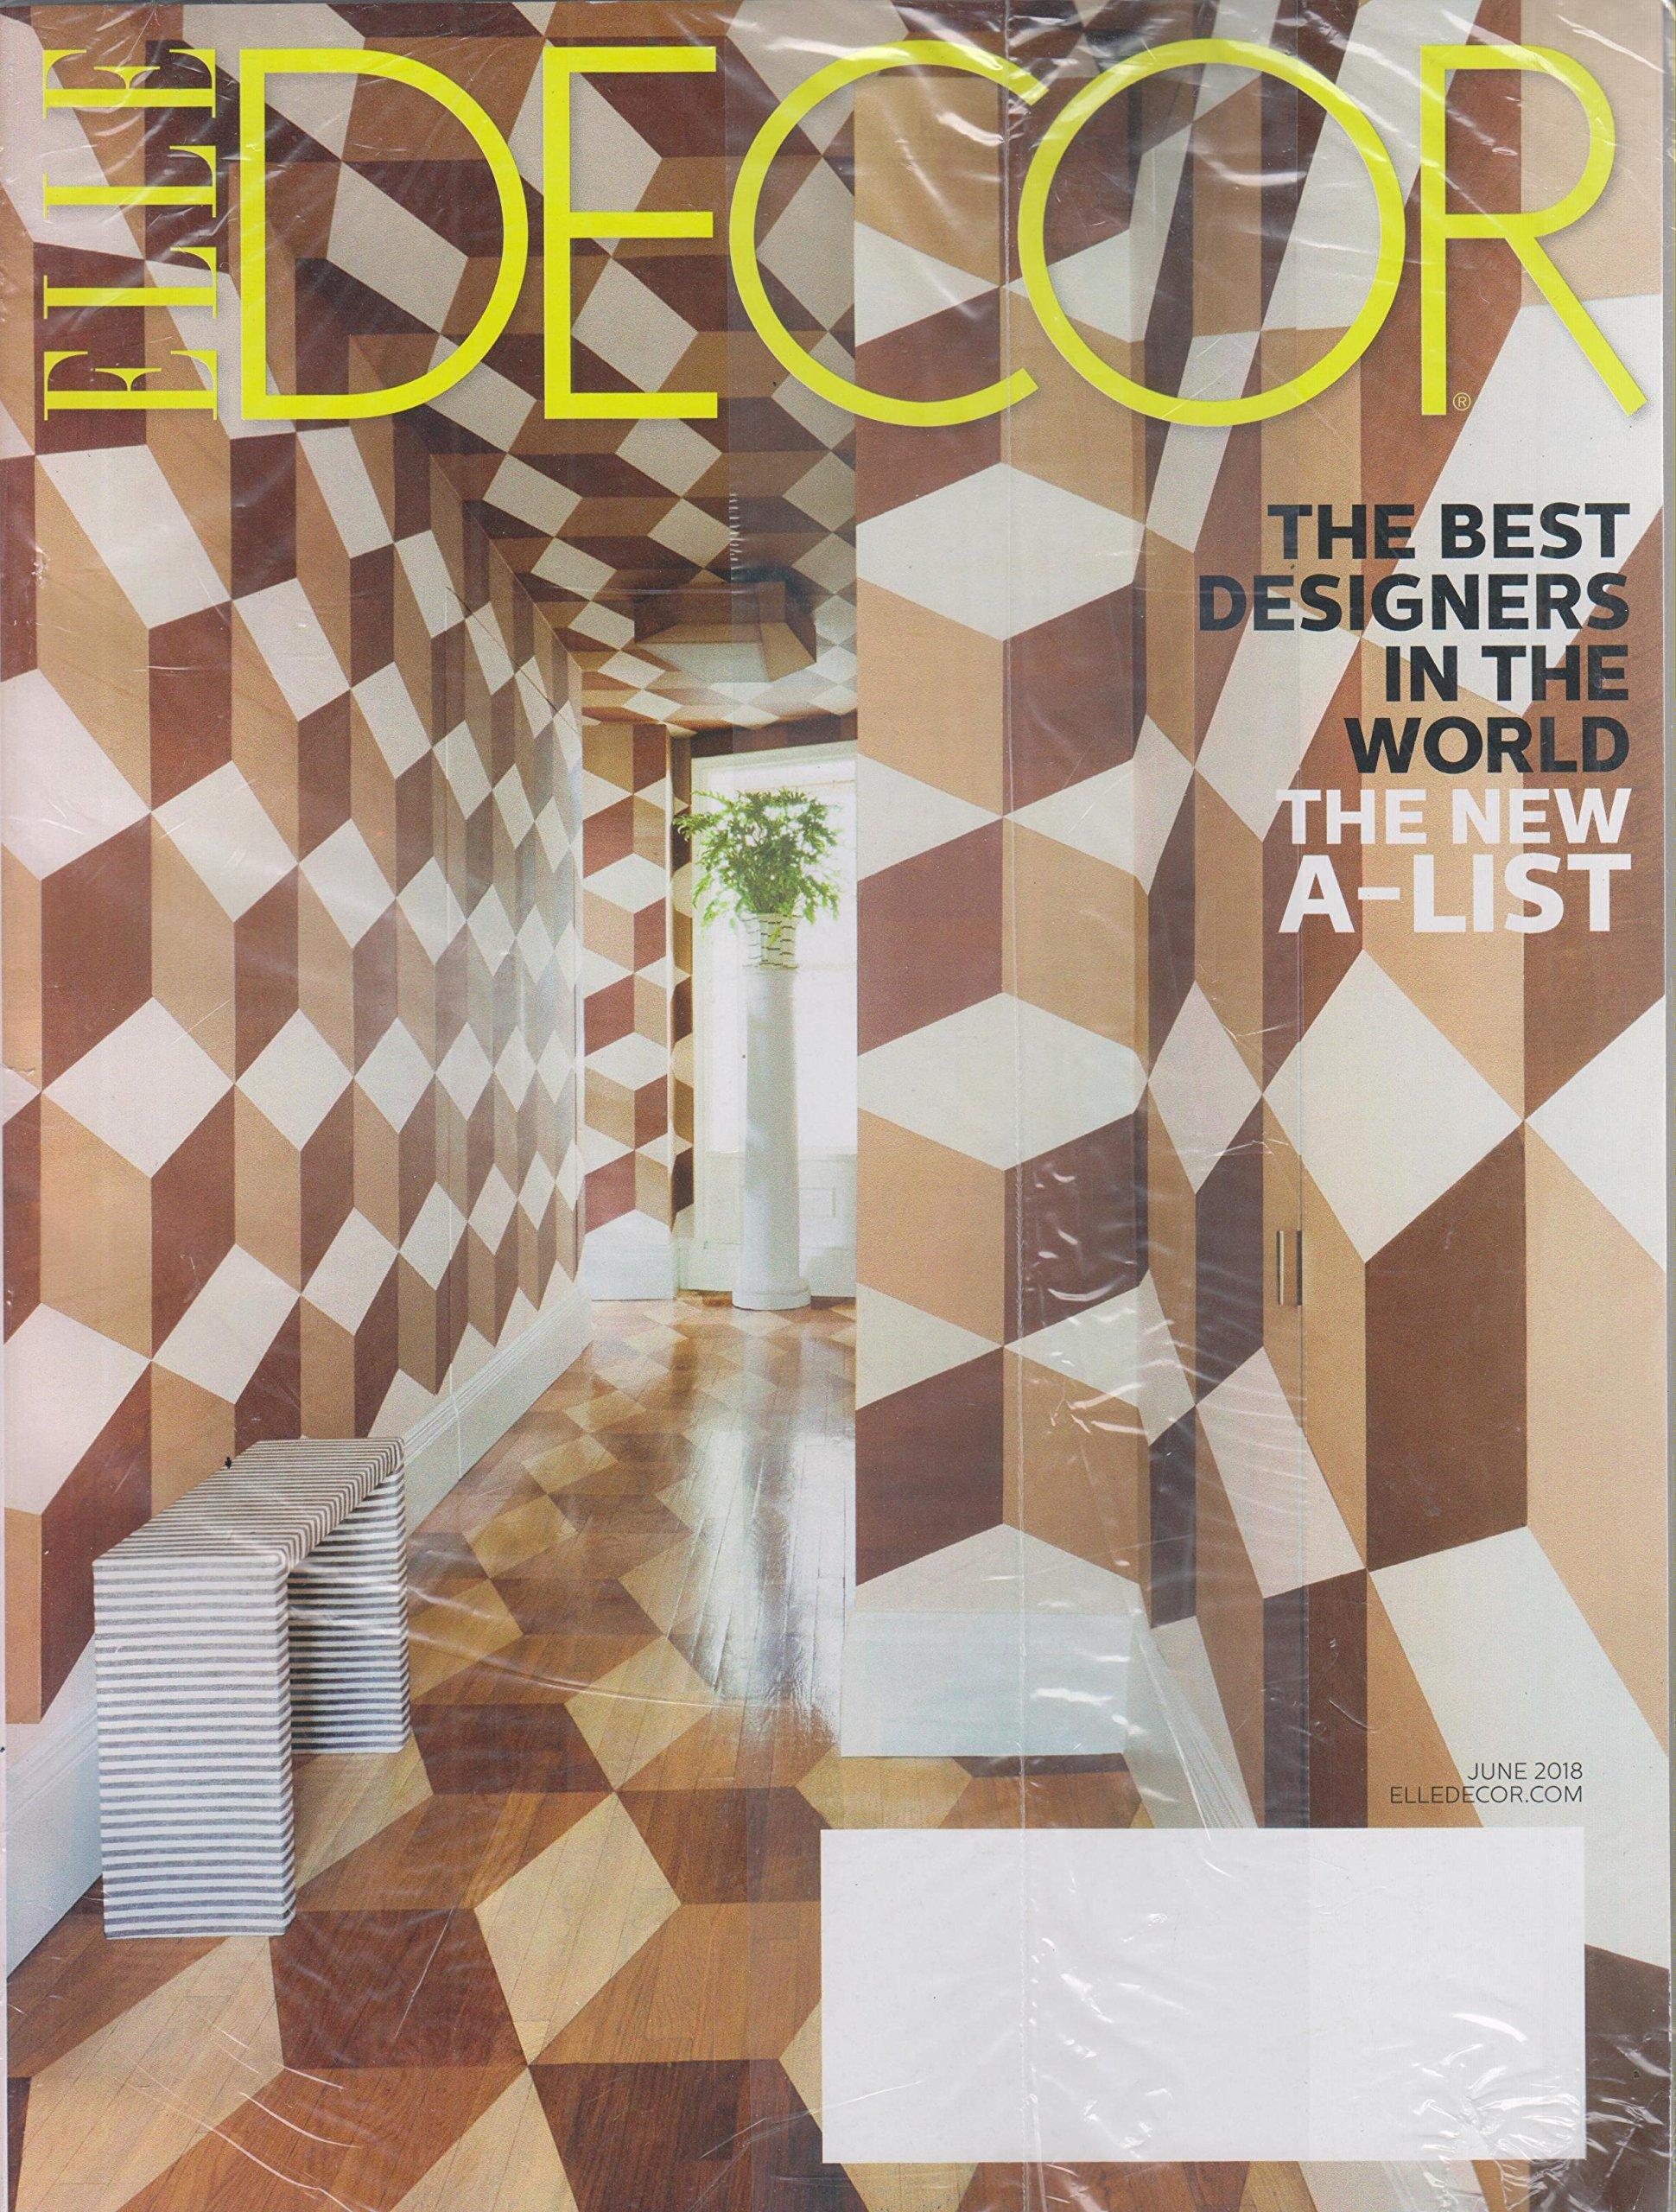 Elle Decor June 2018 The Best Designers In The World The New A List Various Elle Decor Amazon Com Books